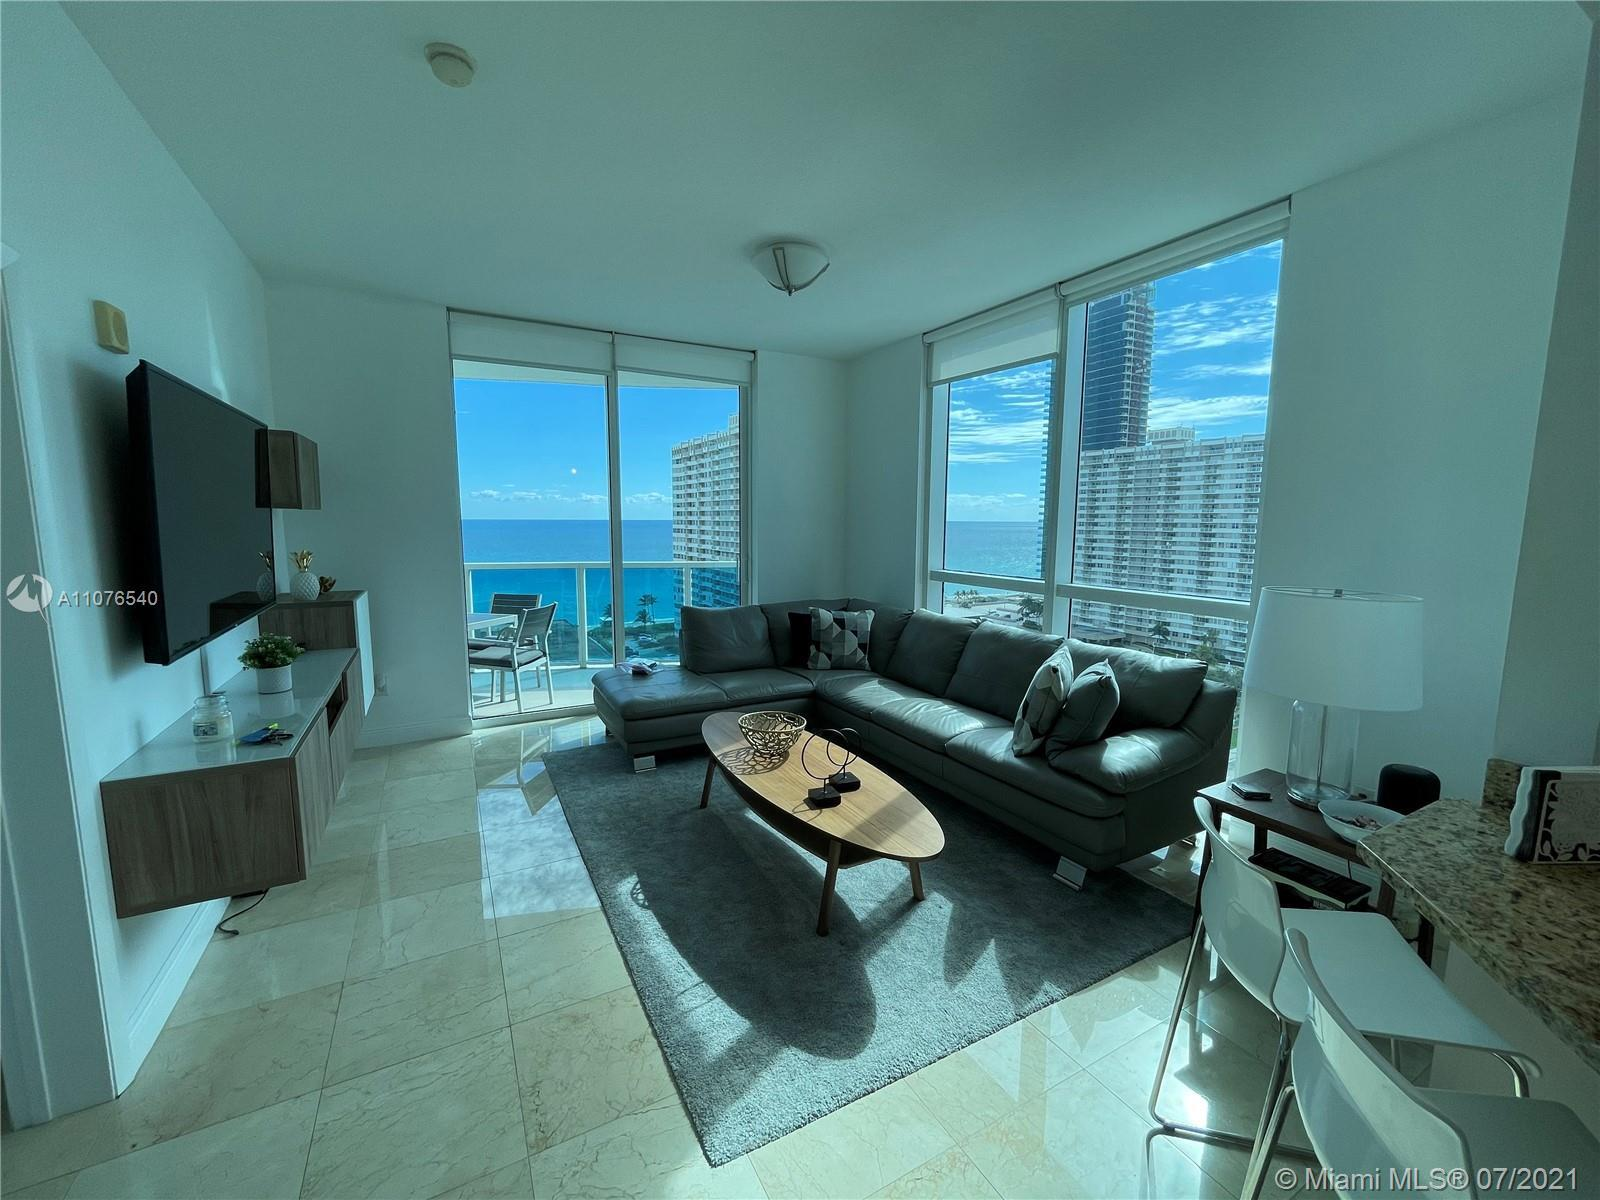 TurnKey beautiful furnished 3 bedroom 3 bath condo with beautiful ocean and intercoastal views. Full